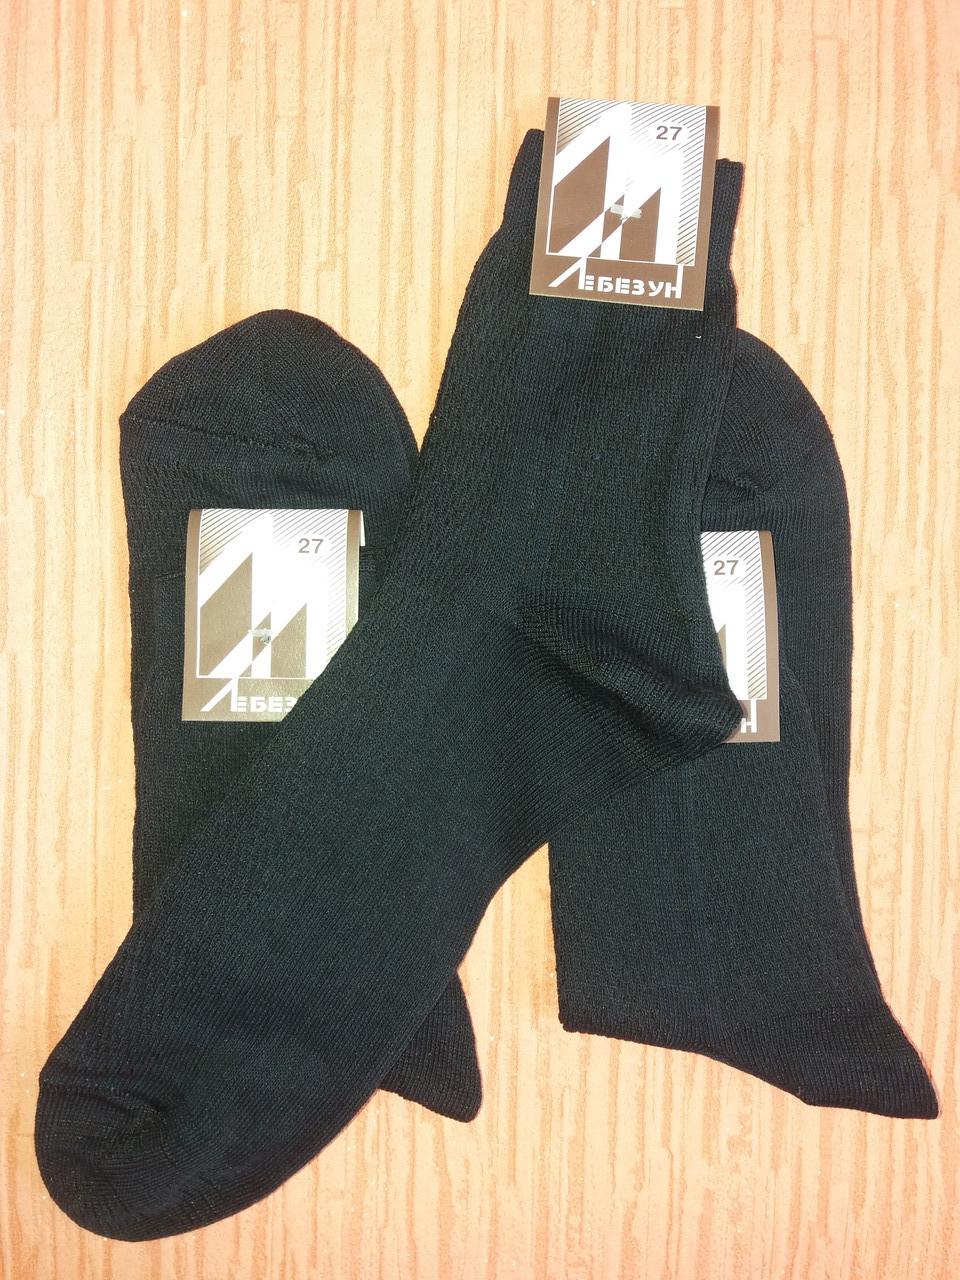 Носки мужские хлопок вставка сеточка высокие р.27 темно-синий. От 10 пар по 4,80грн